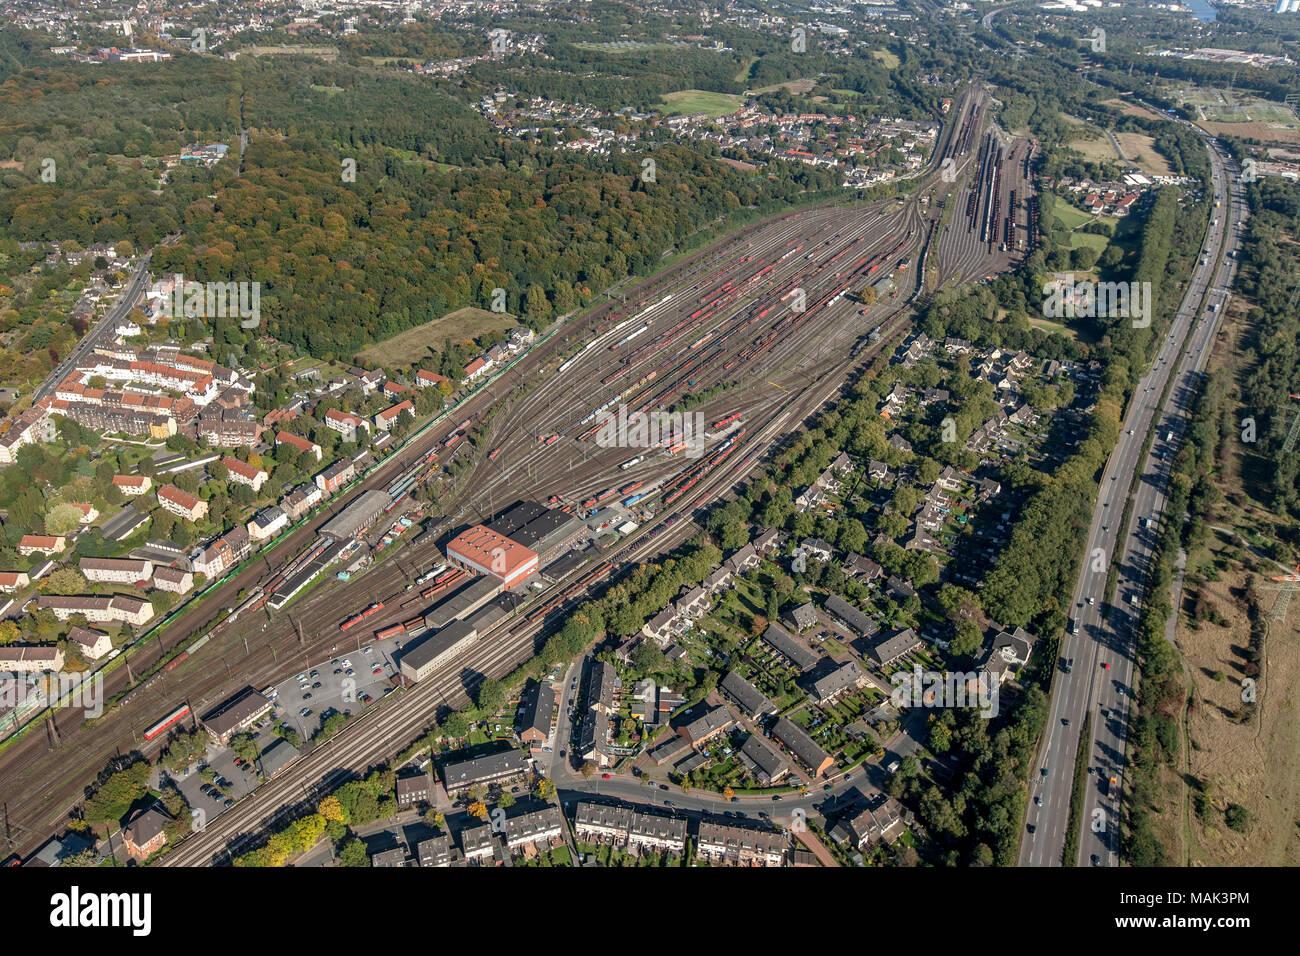 Aerial view, signal box 4 on the Ostberg in Oberhausen-Osterfeld, Oberhausen, Ruhr area, North Rhine-Westphalia, Germany, Europe, birds-eyes view, aer - Stock Image